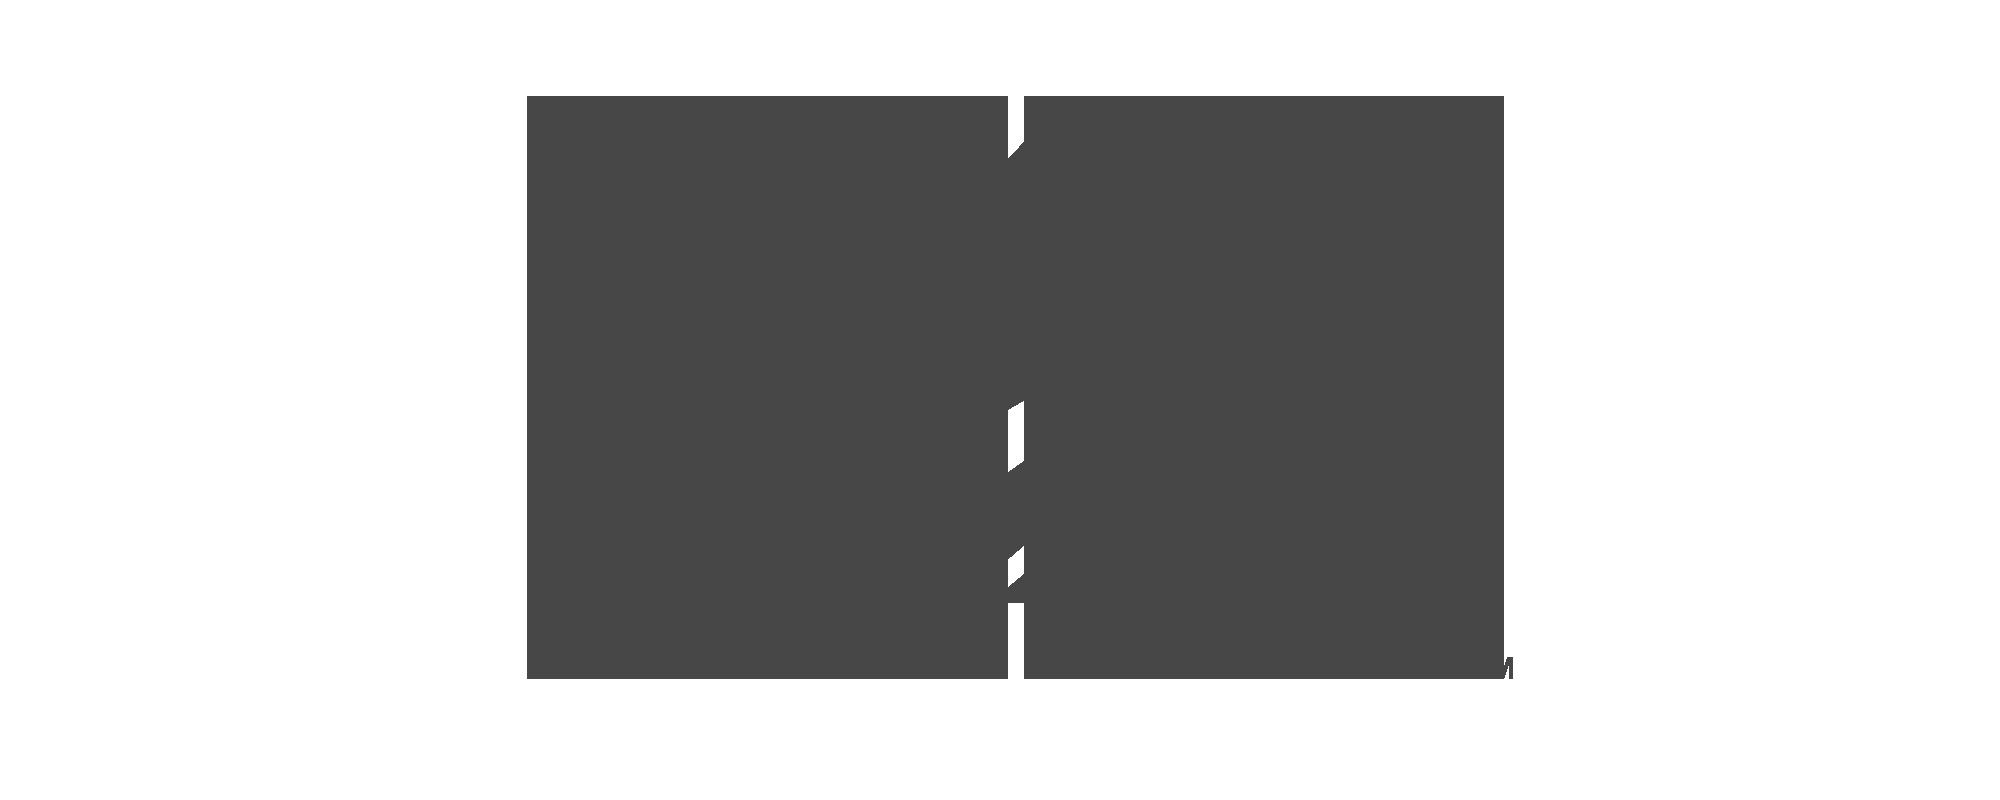 https://www.shirtstore.se/pub_docs/files/Mer/Logoline_MTV_20x8.png